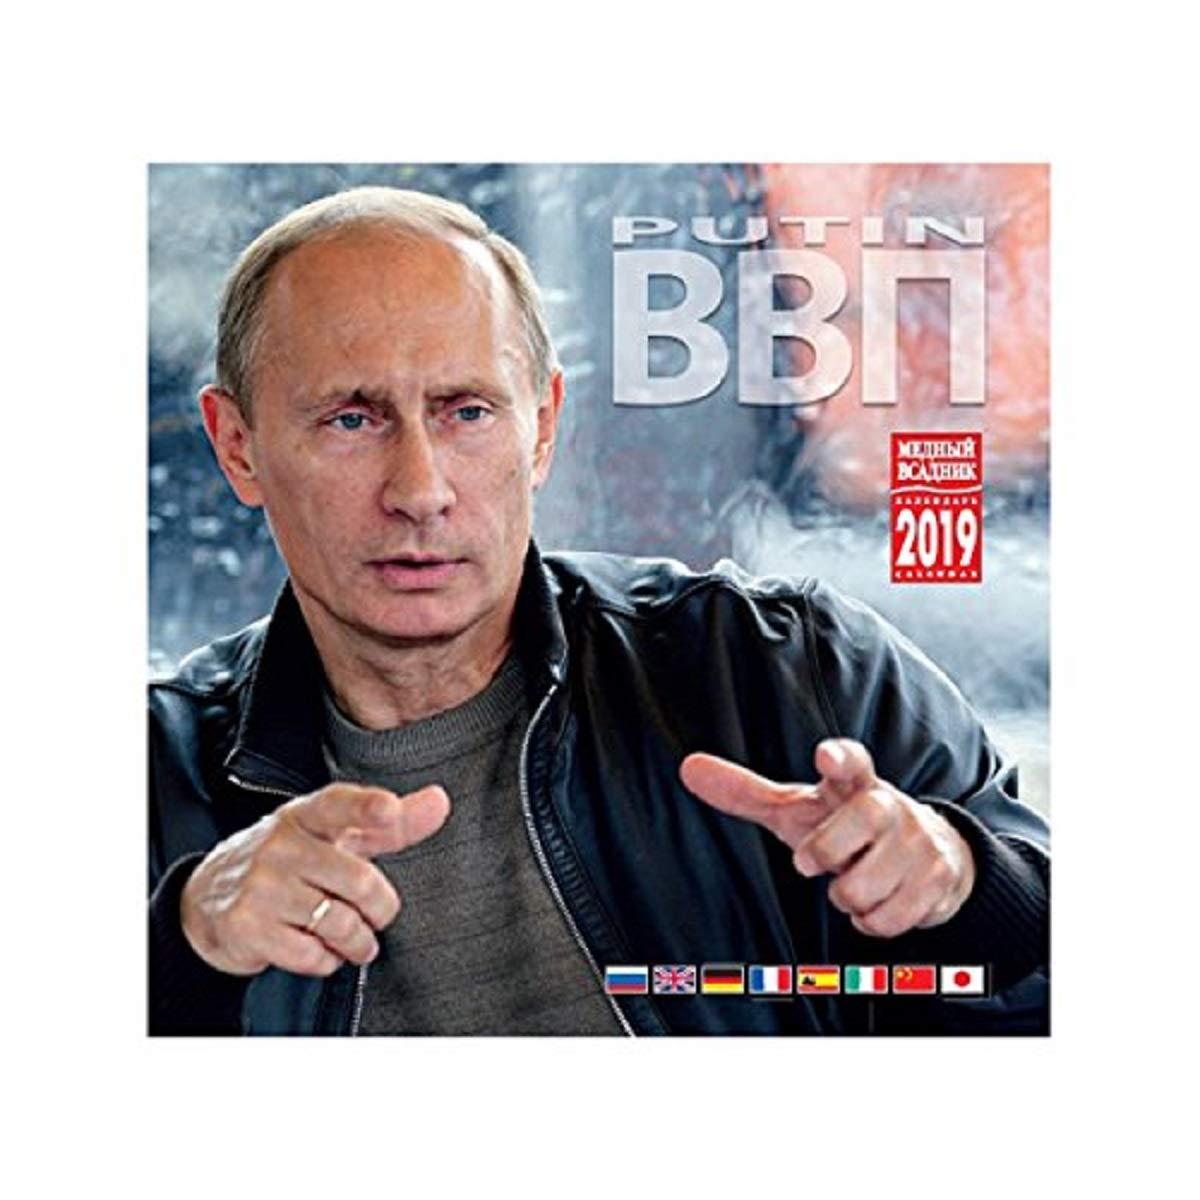 Vladimir Putin Wall Calendar for 2019, Size: 11.8x11.8 inches (30×30cm), 8 Languages (Japanese, English, Russian, etc.)